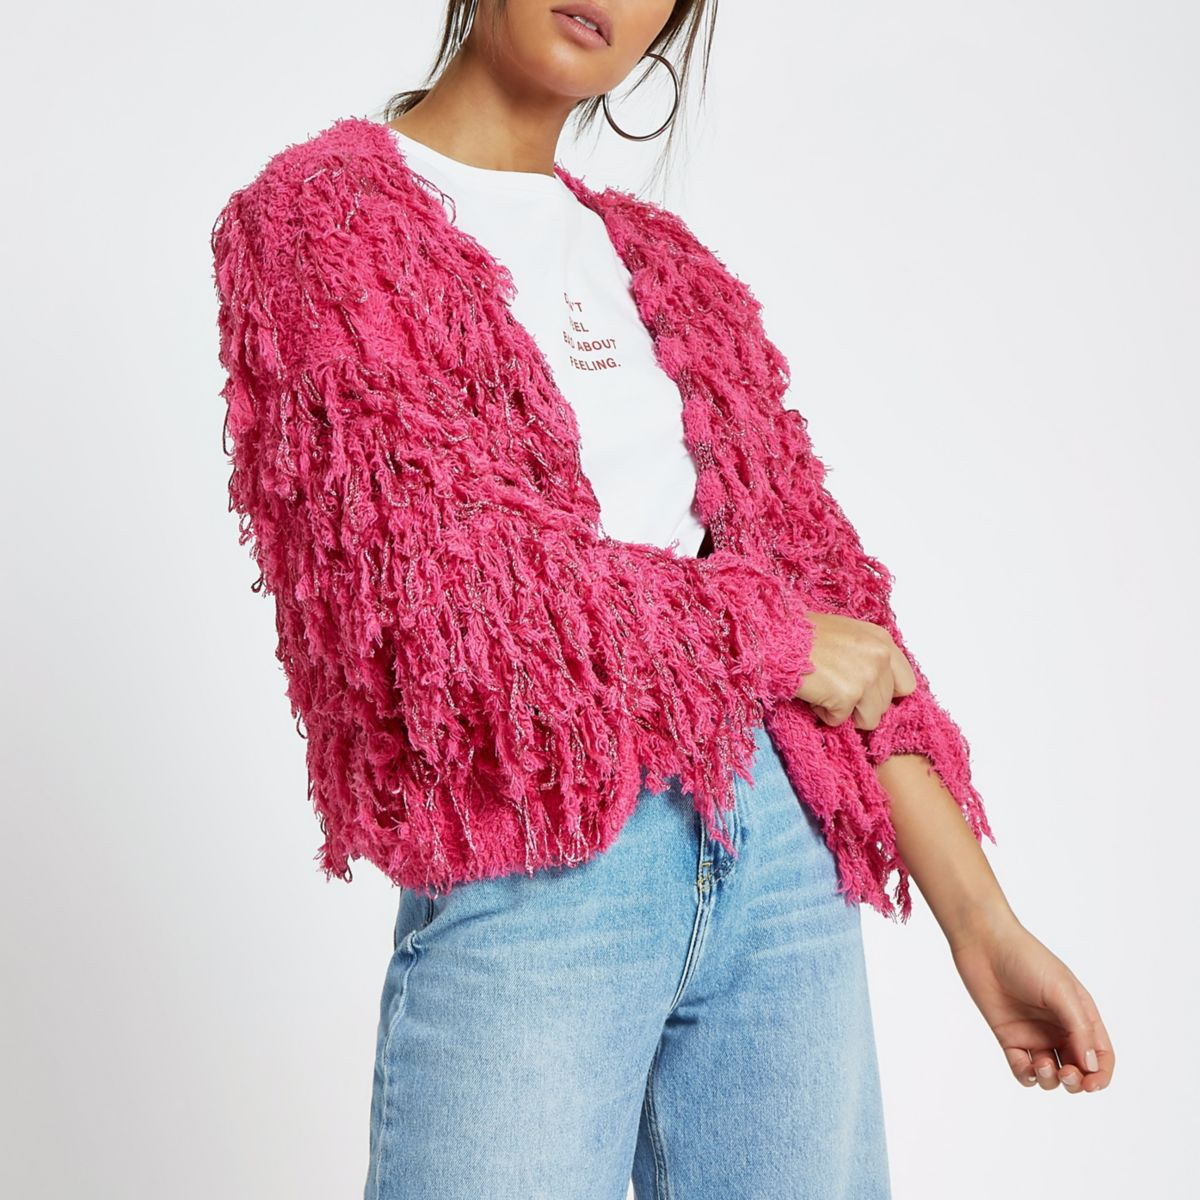 Pink stripe trophy knit cardigan